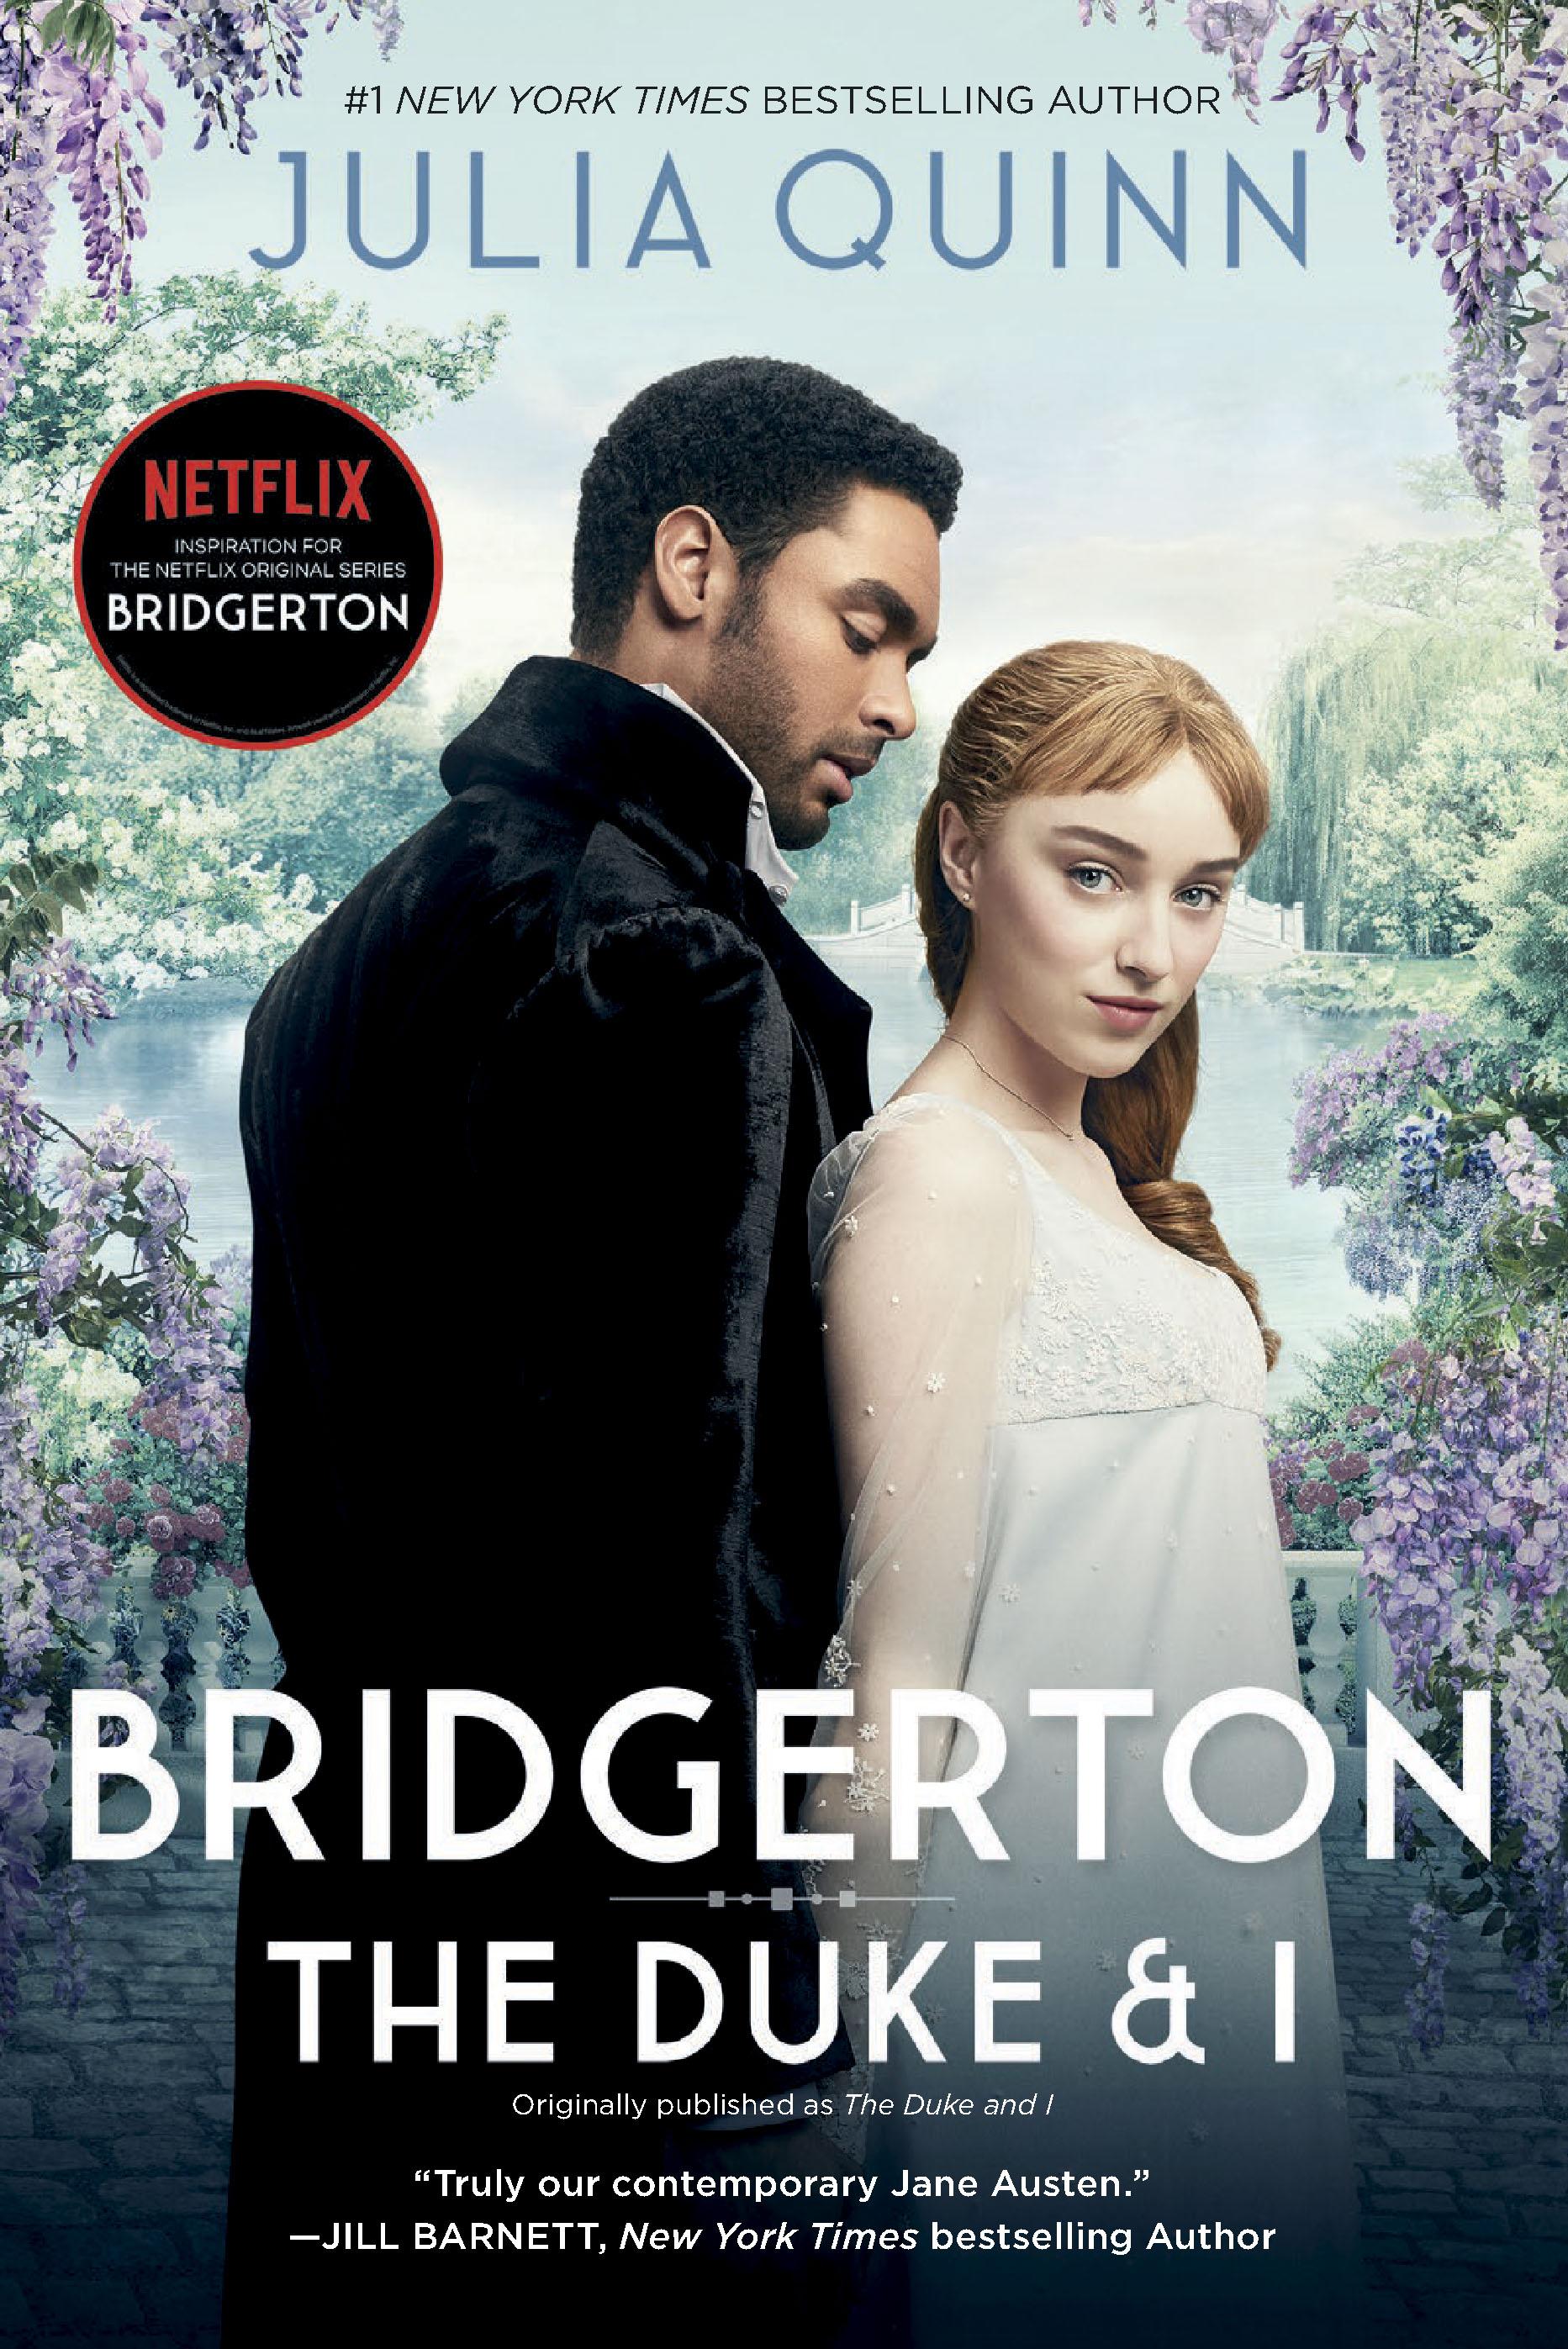 The Duke and I | Julia Quinn | Author of Historical Romance Novels  bridgerton